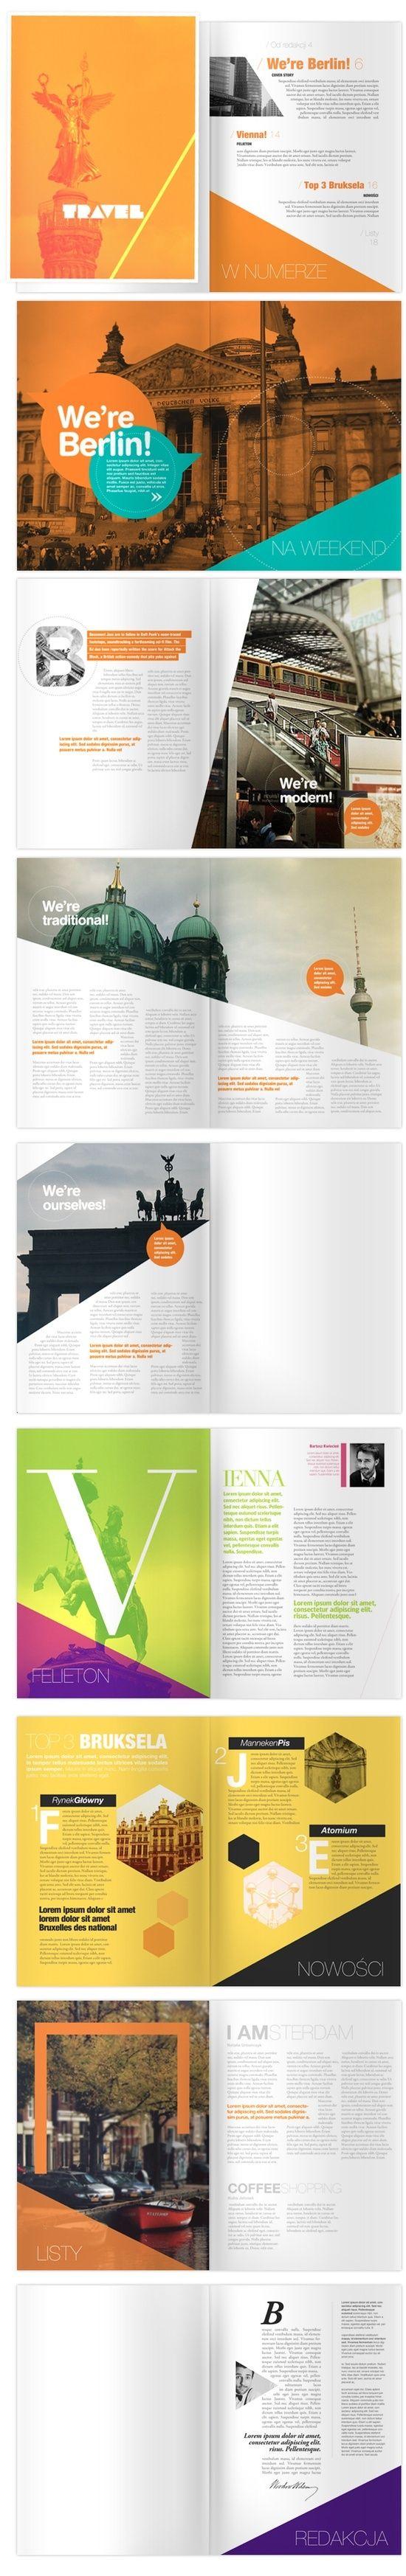 TRAVEL Magazine@希洛采集到书面(984图)_花瓣平面设计